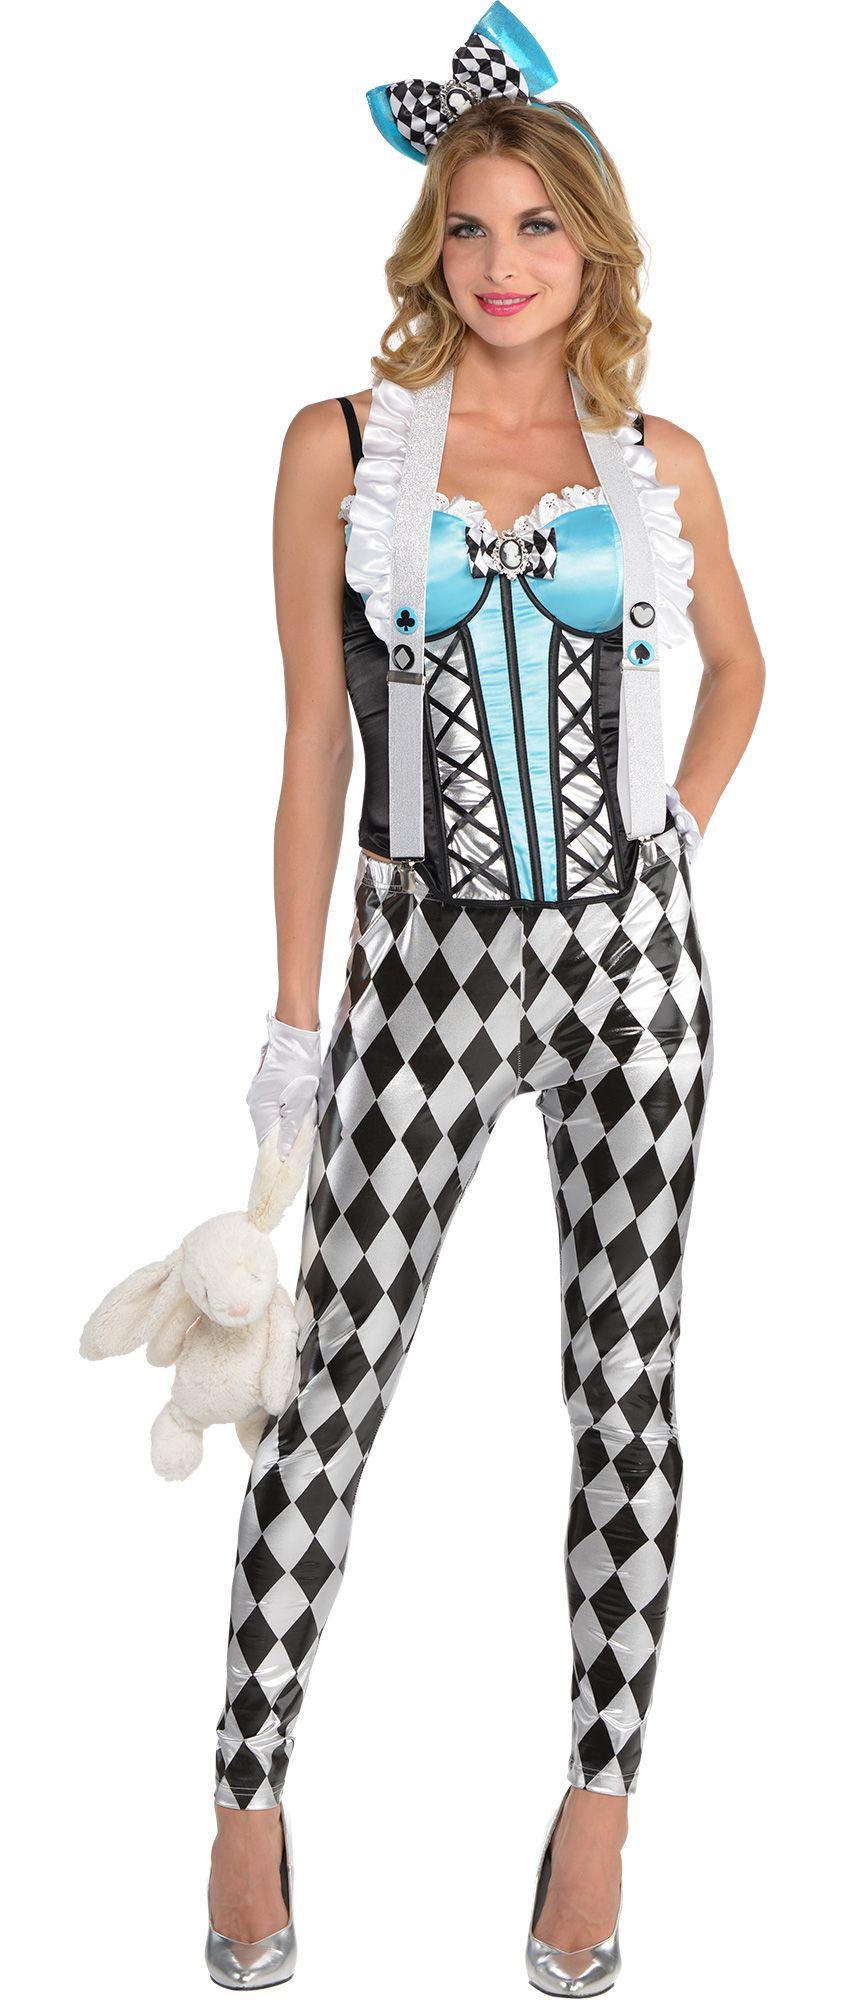 Create Your Own Look - Female Alice in Wonderland #3